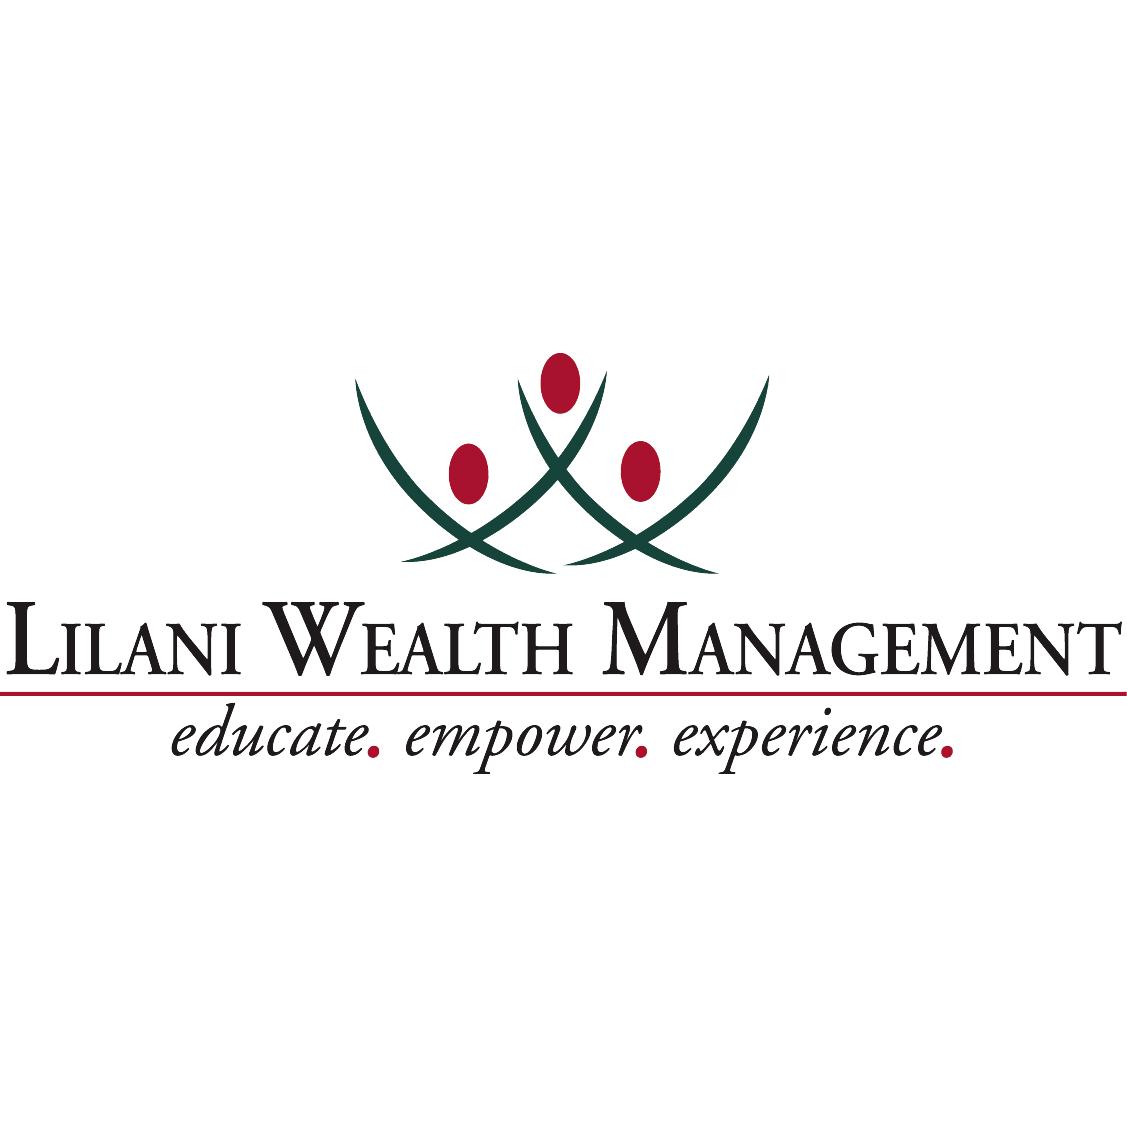 Lilani Wealth Management image 2